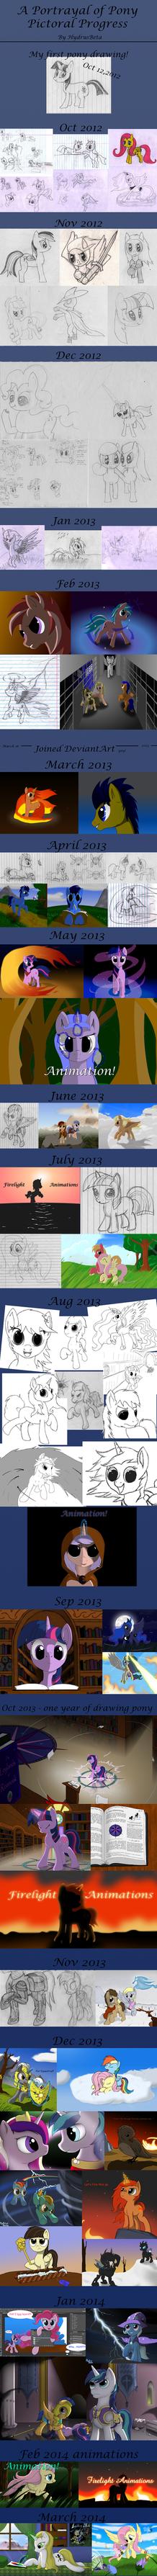 A Portrayal of Pony Pictoral Progress by HydrusBeta